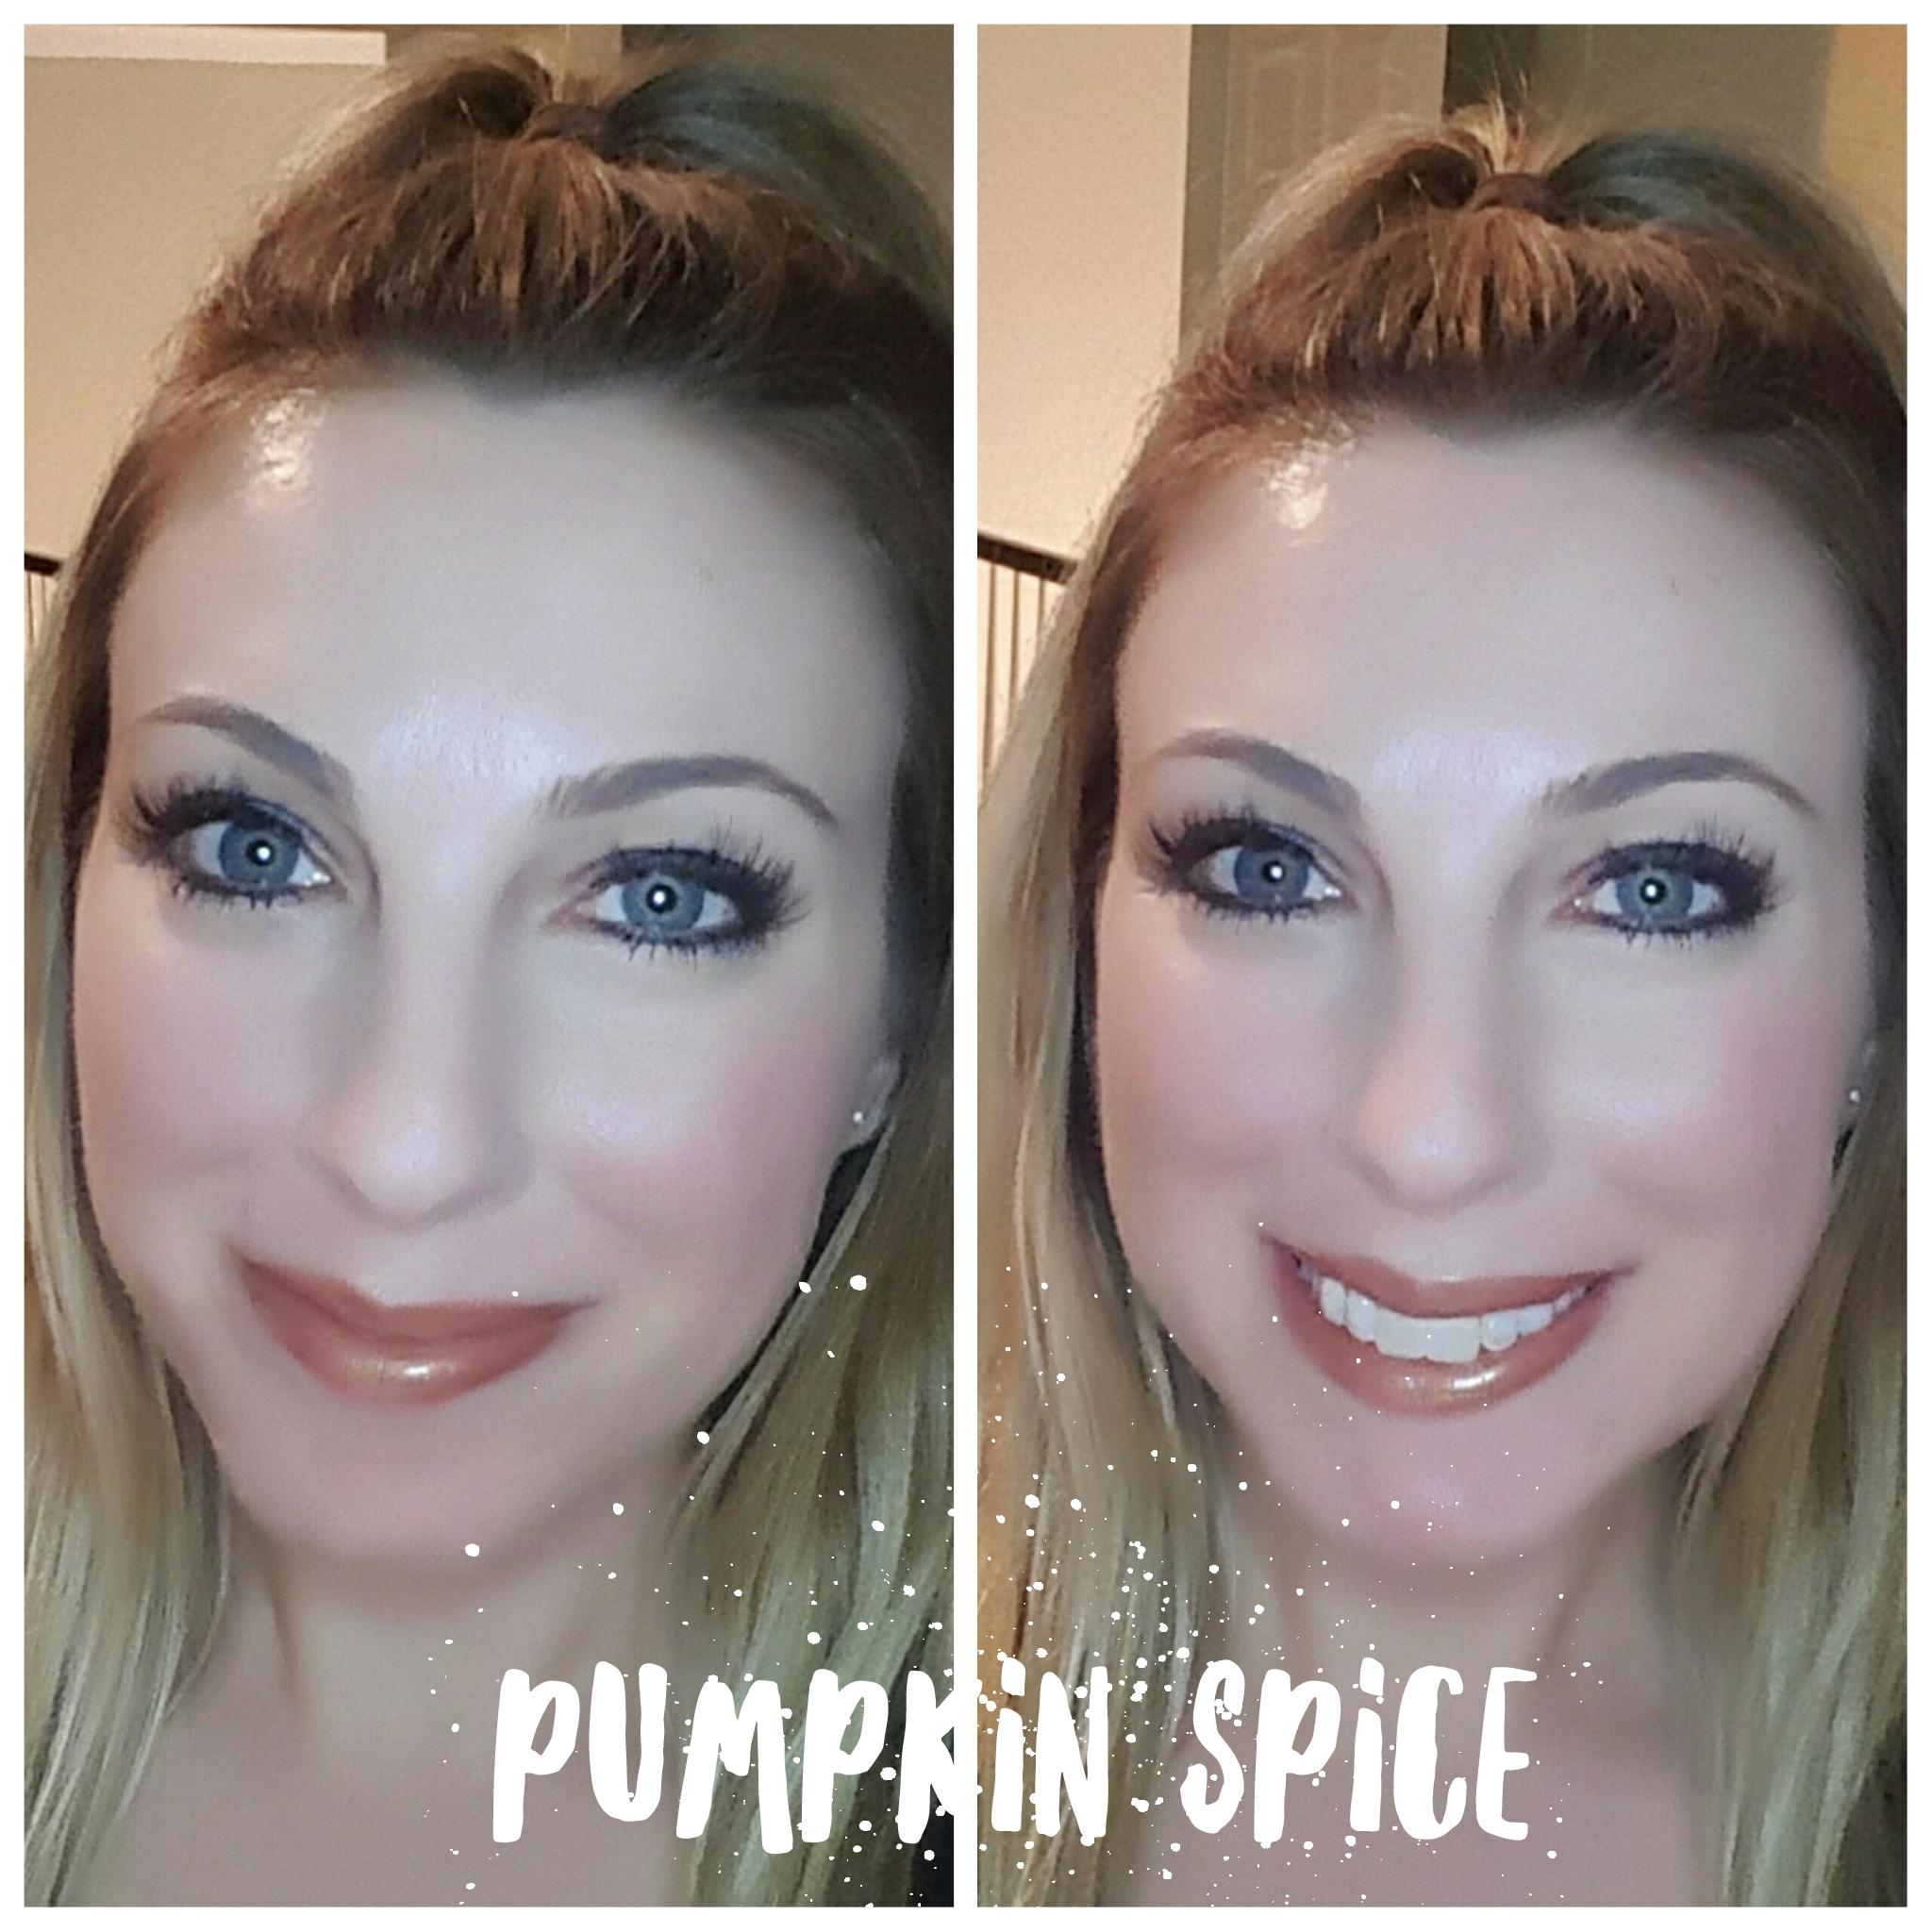 pumpkin-spice-selfie